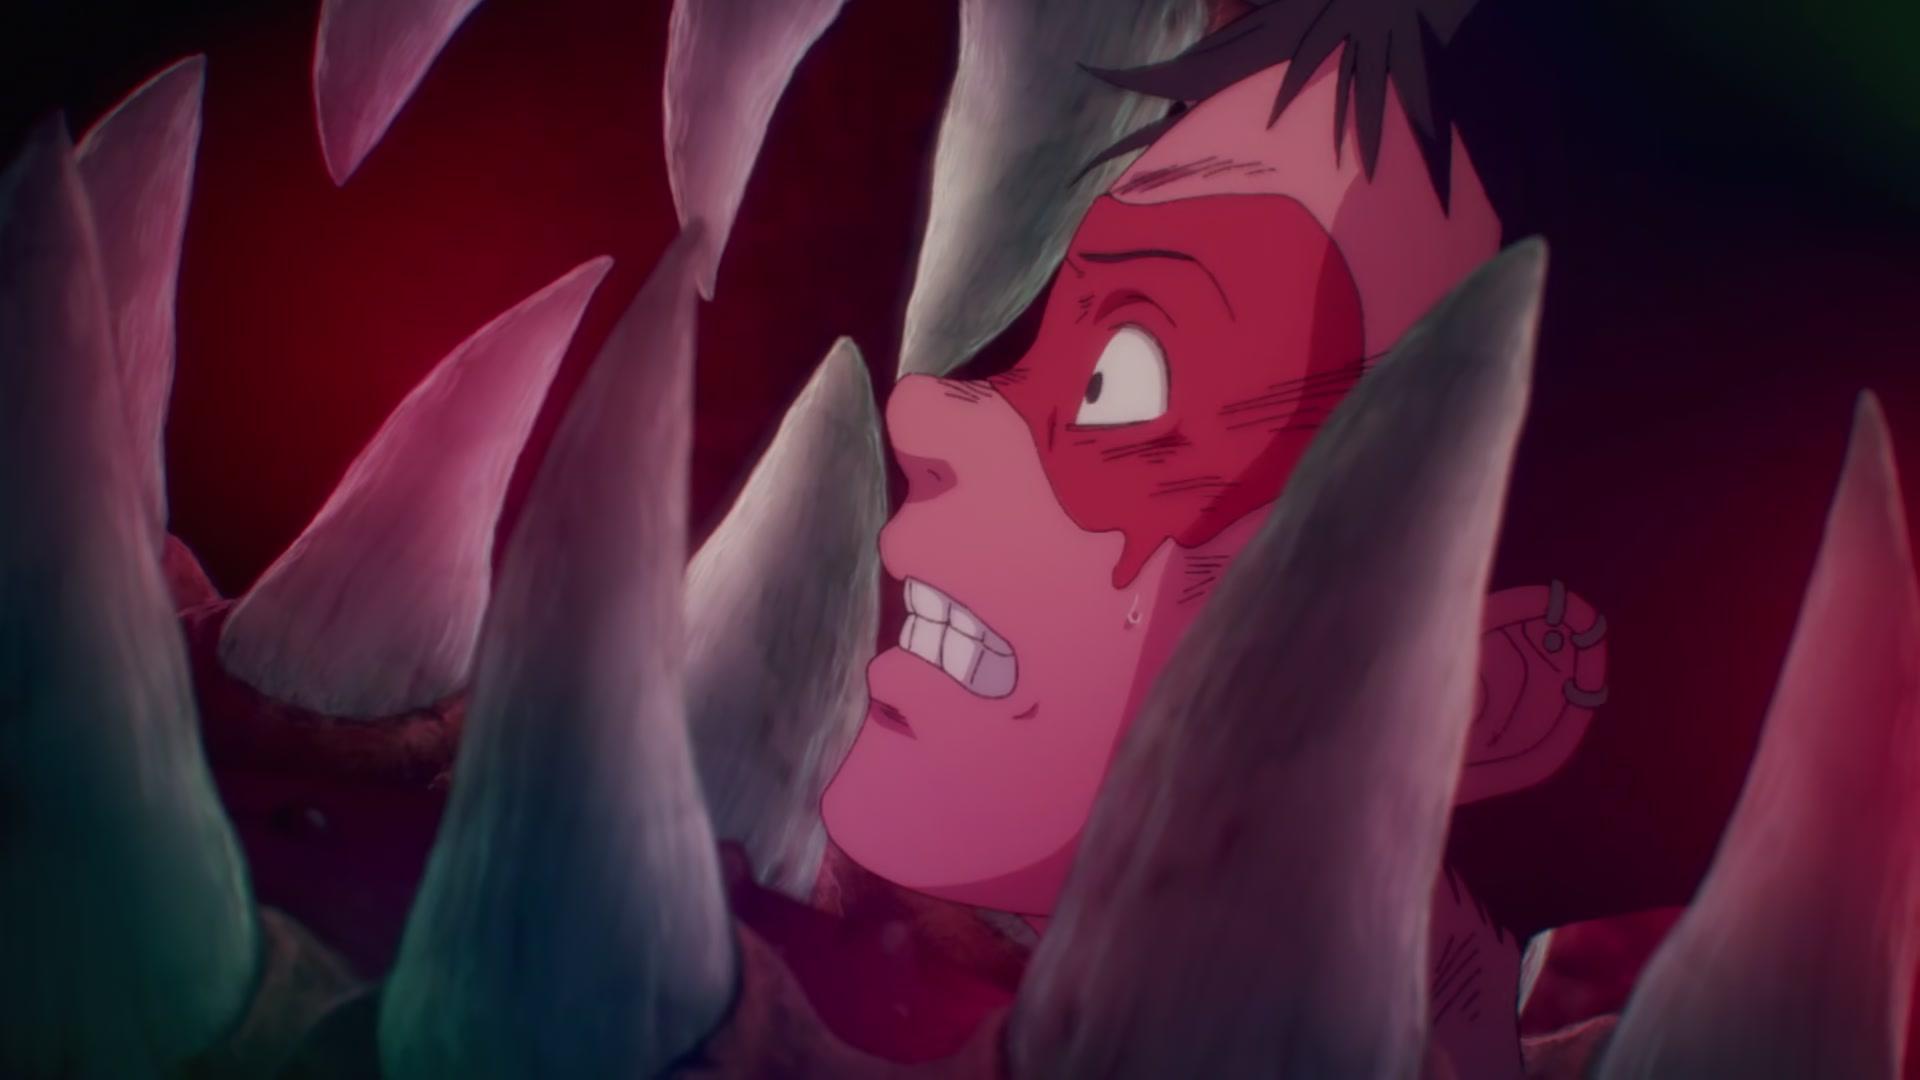 Dorohedoro anime episode 1